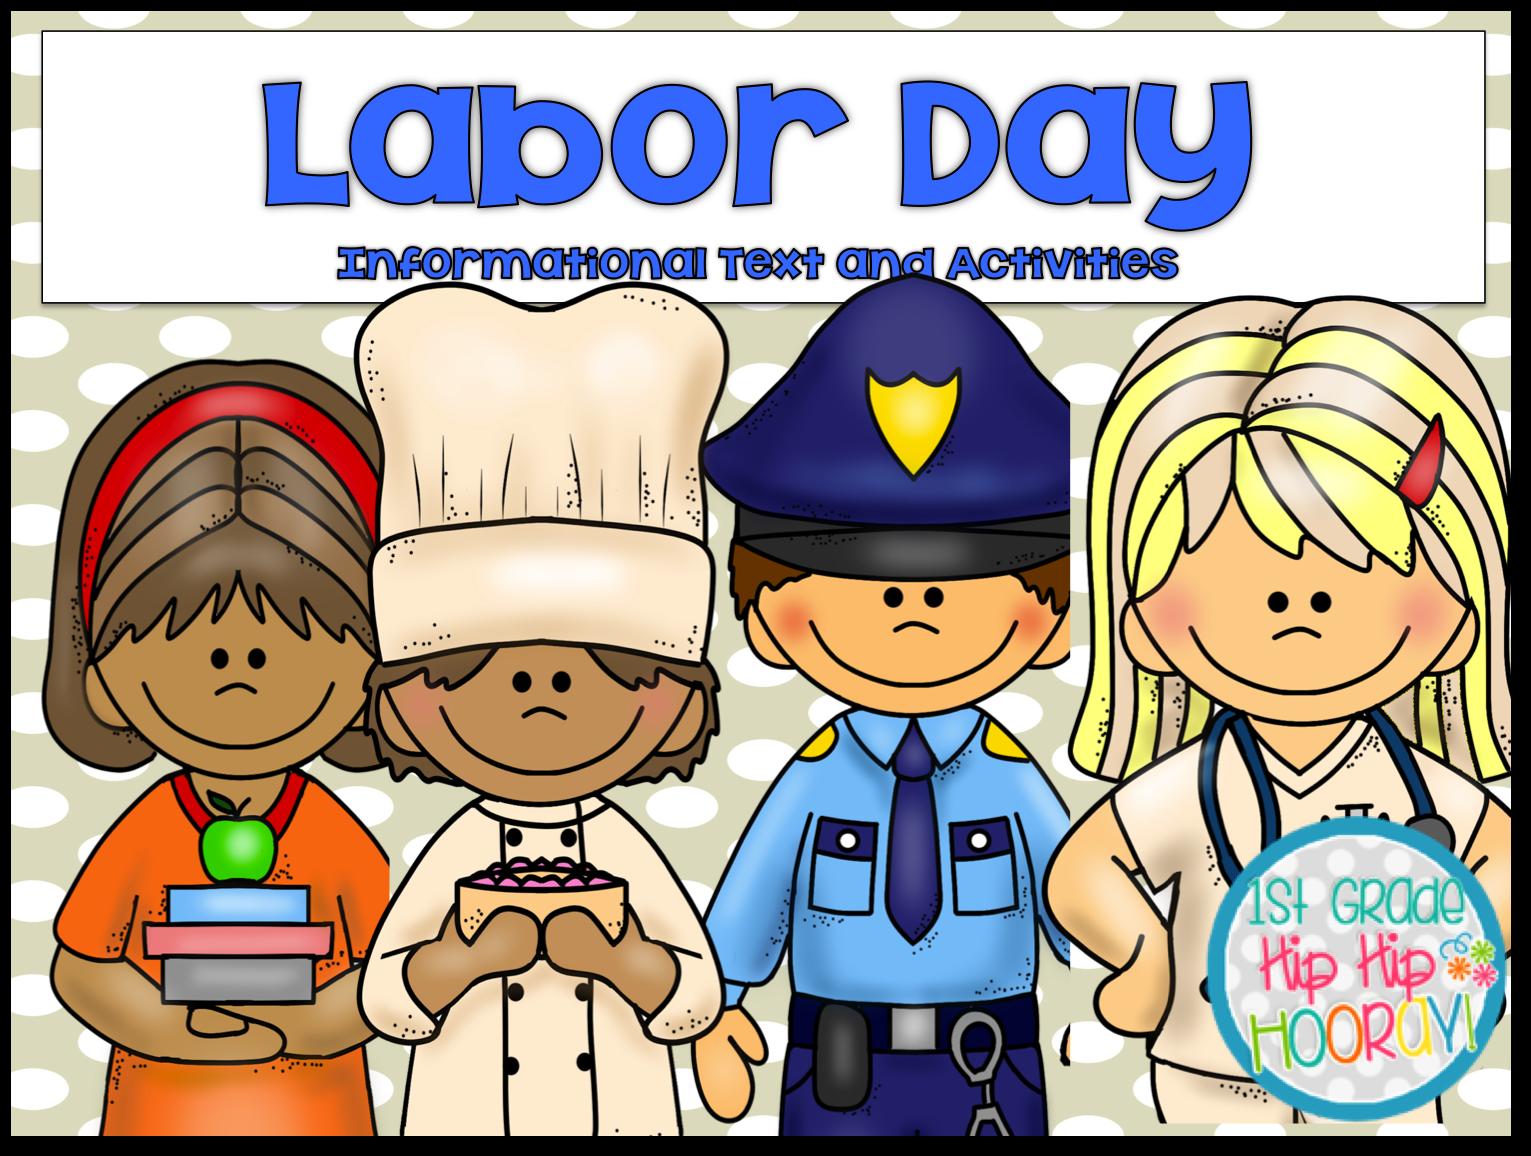 medium resolution of 1st Grade Hip Hip Hooray!: Labor Day! #morethanathreedayweekend